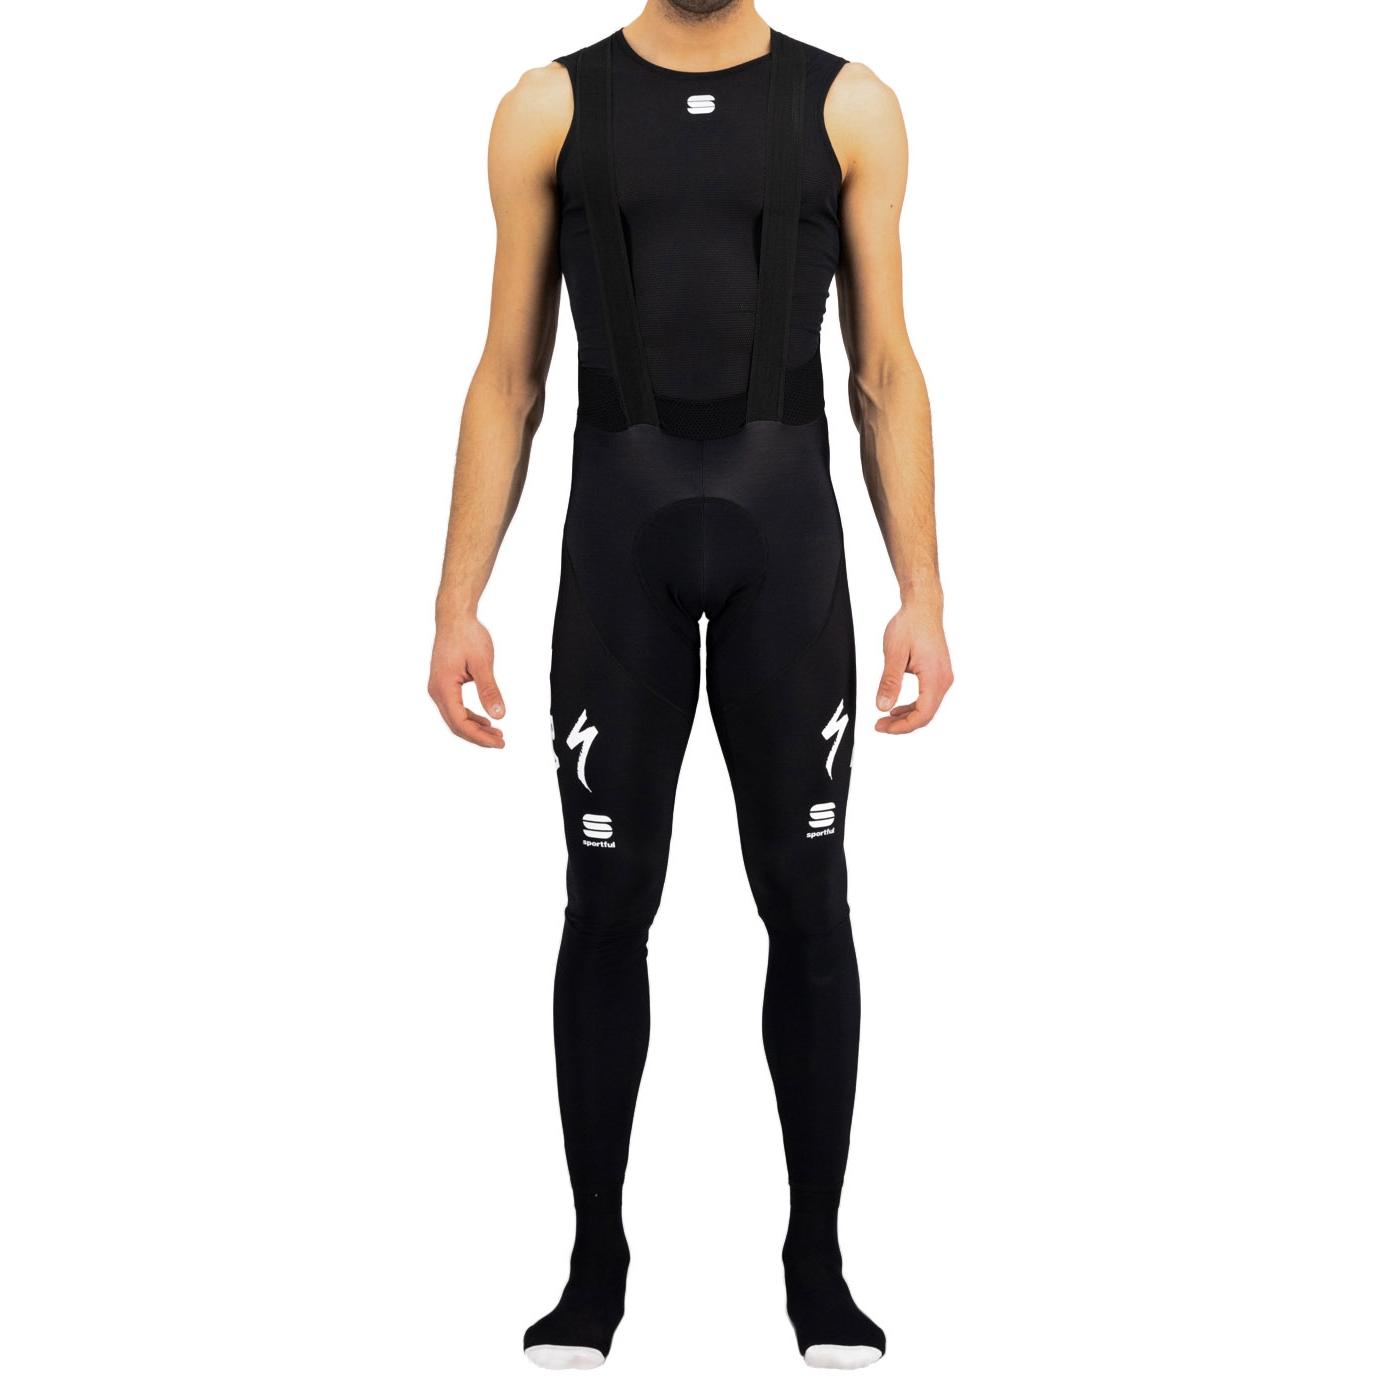 Sportful BORA hansgrohe Bodyfit Pro Bibtights - 002 Black